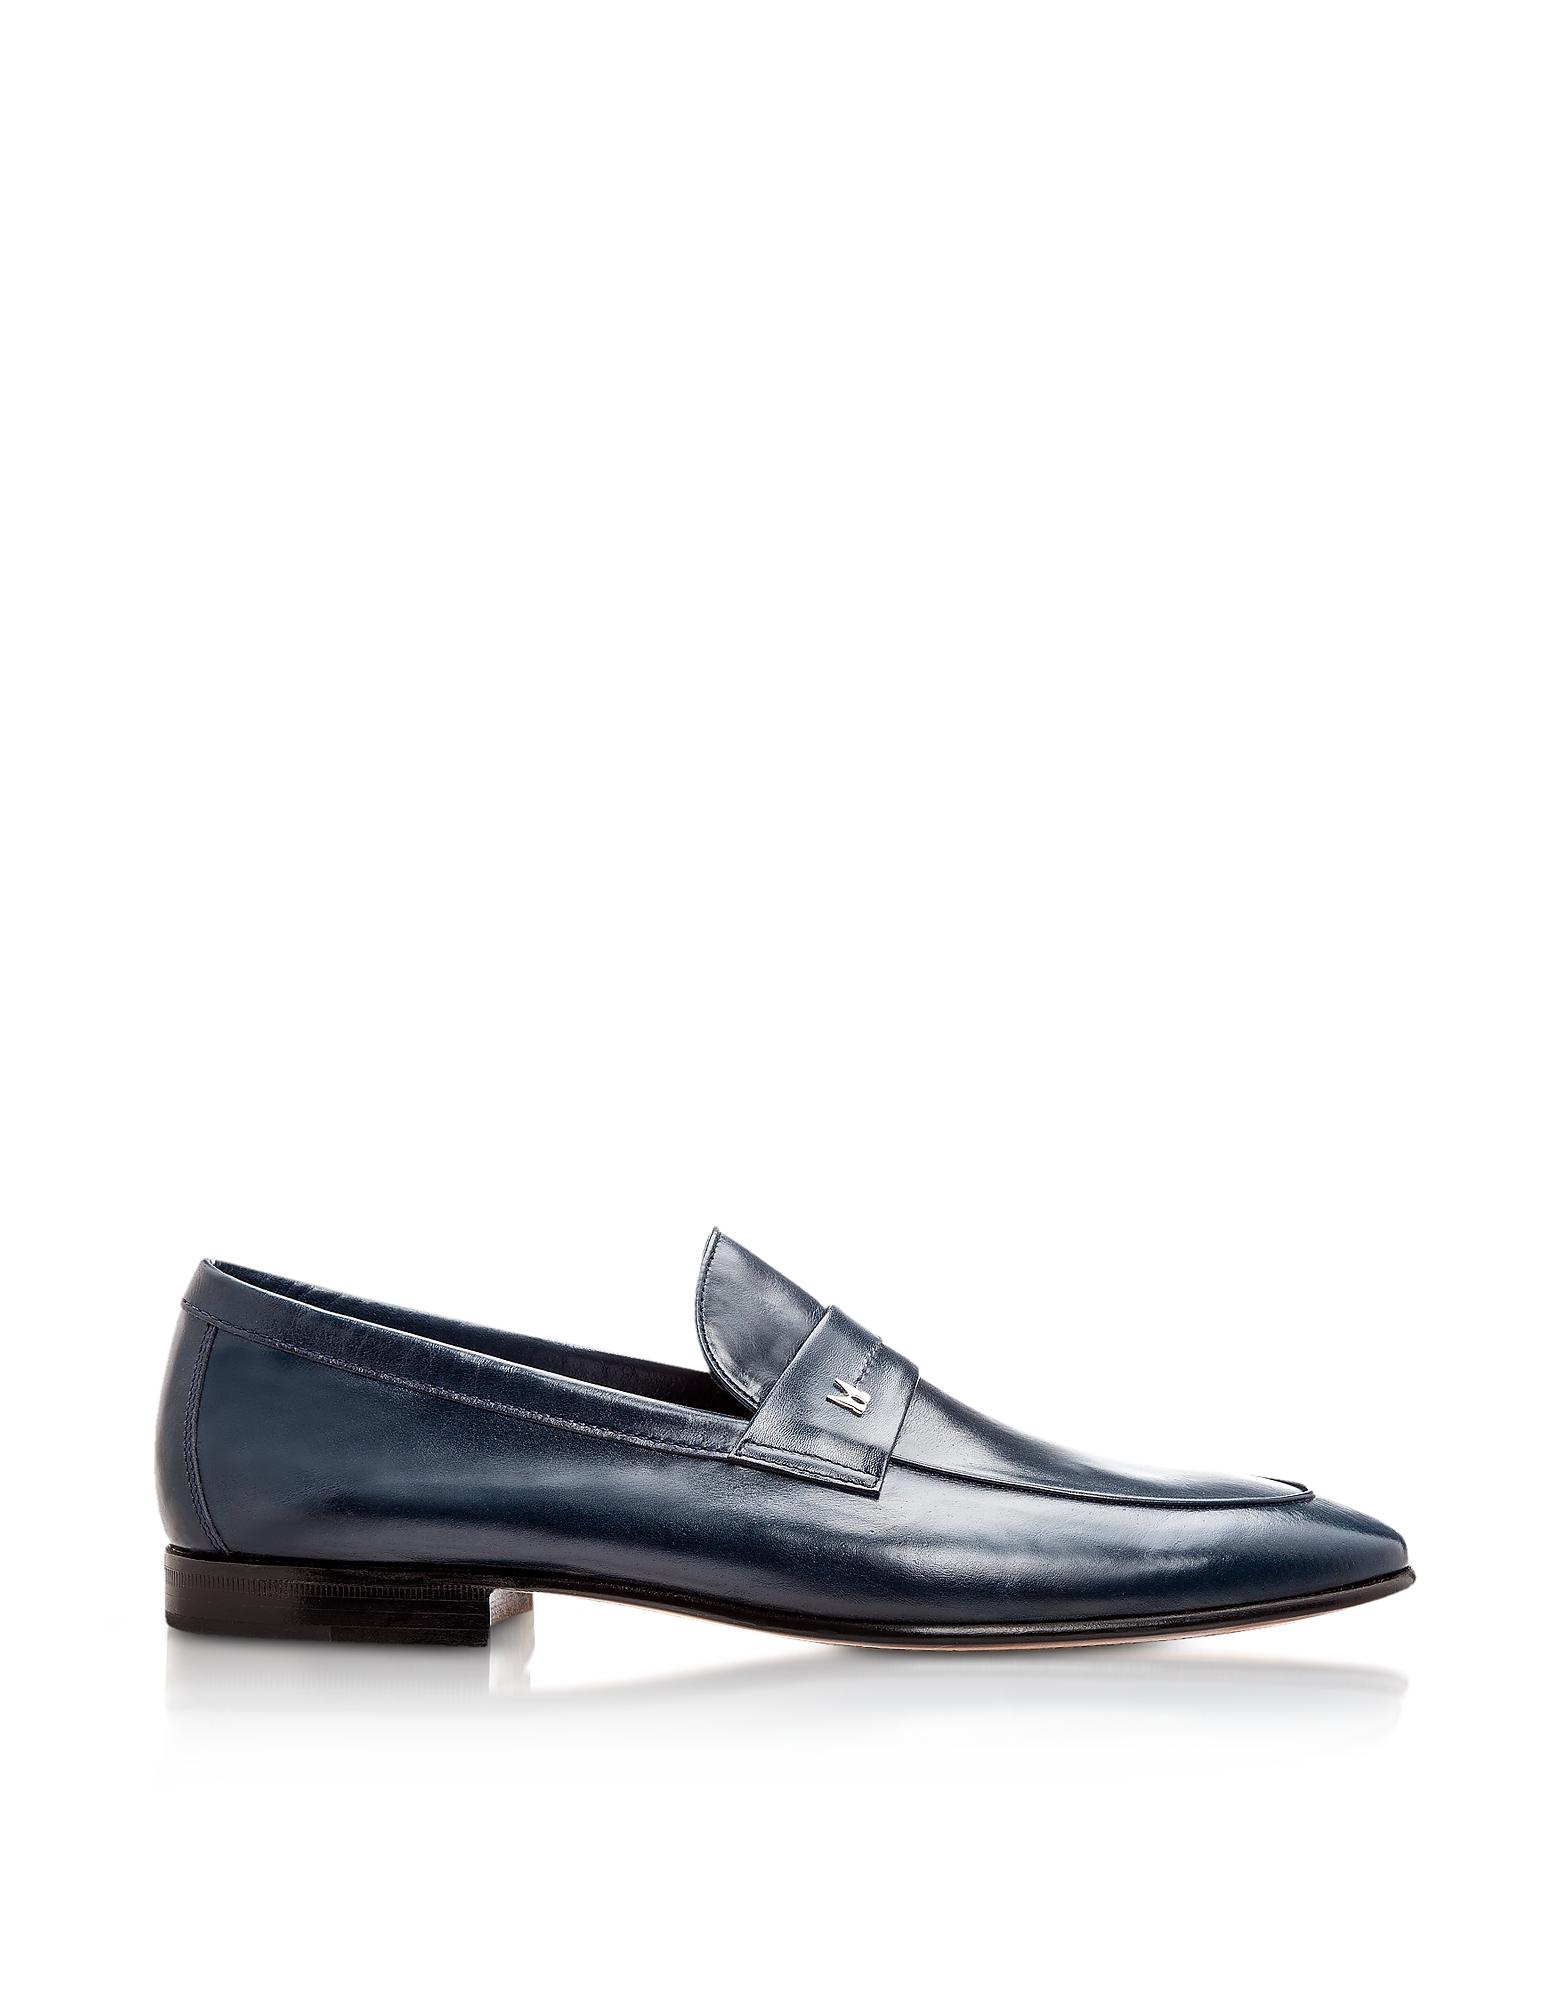 Moreschi Shoes, Brisbane Navy Kangaroo Leather Loafer Shoes